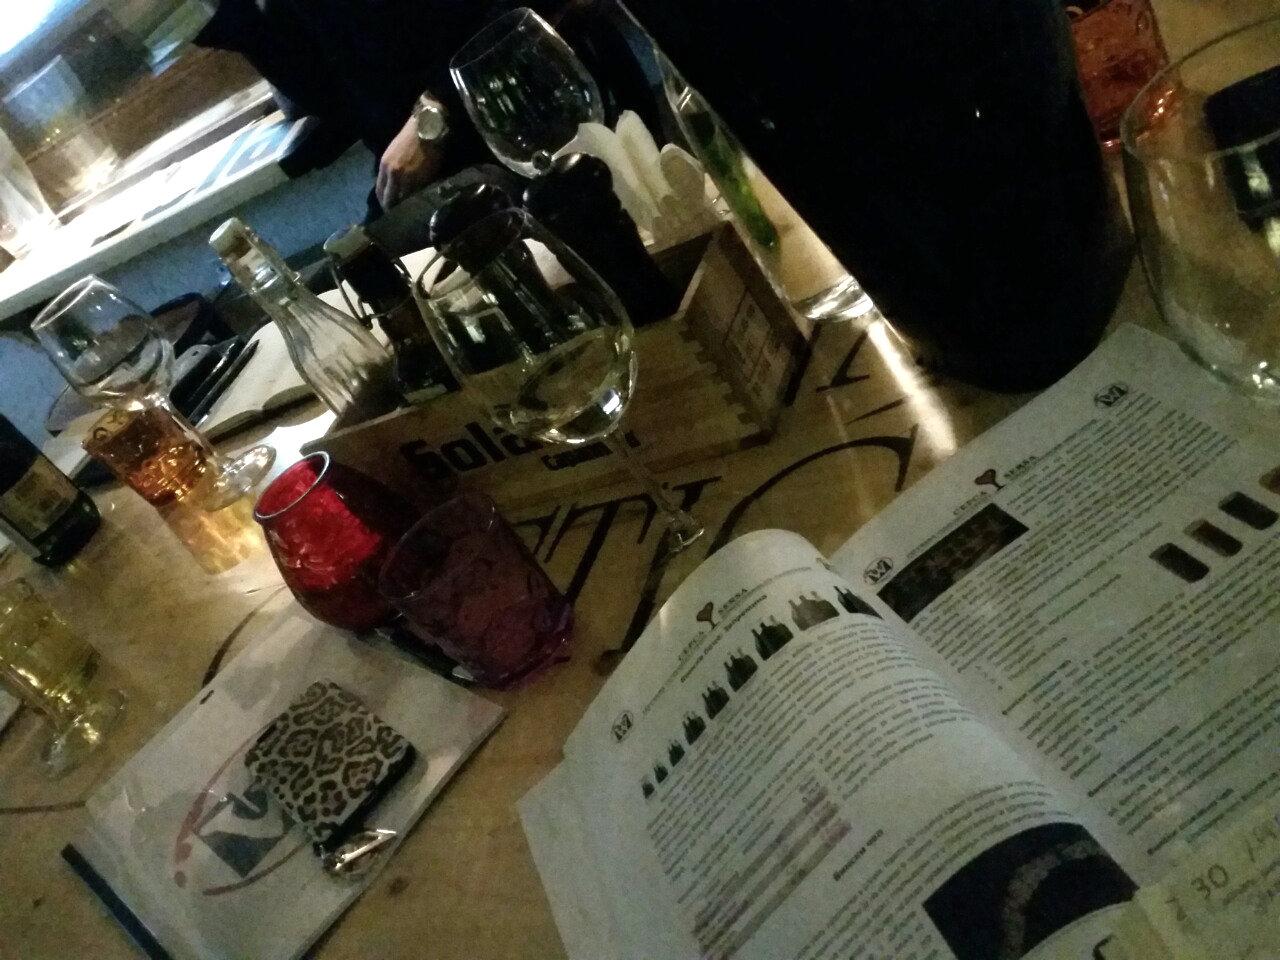 vinska škola, steak&wine